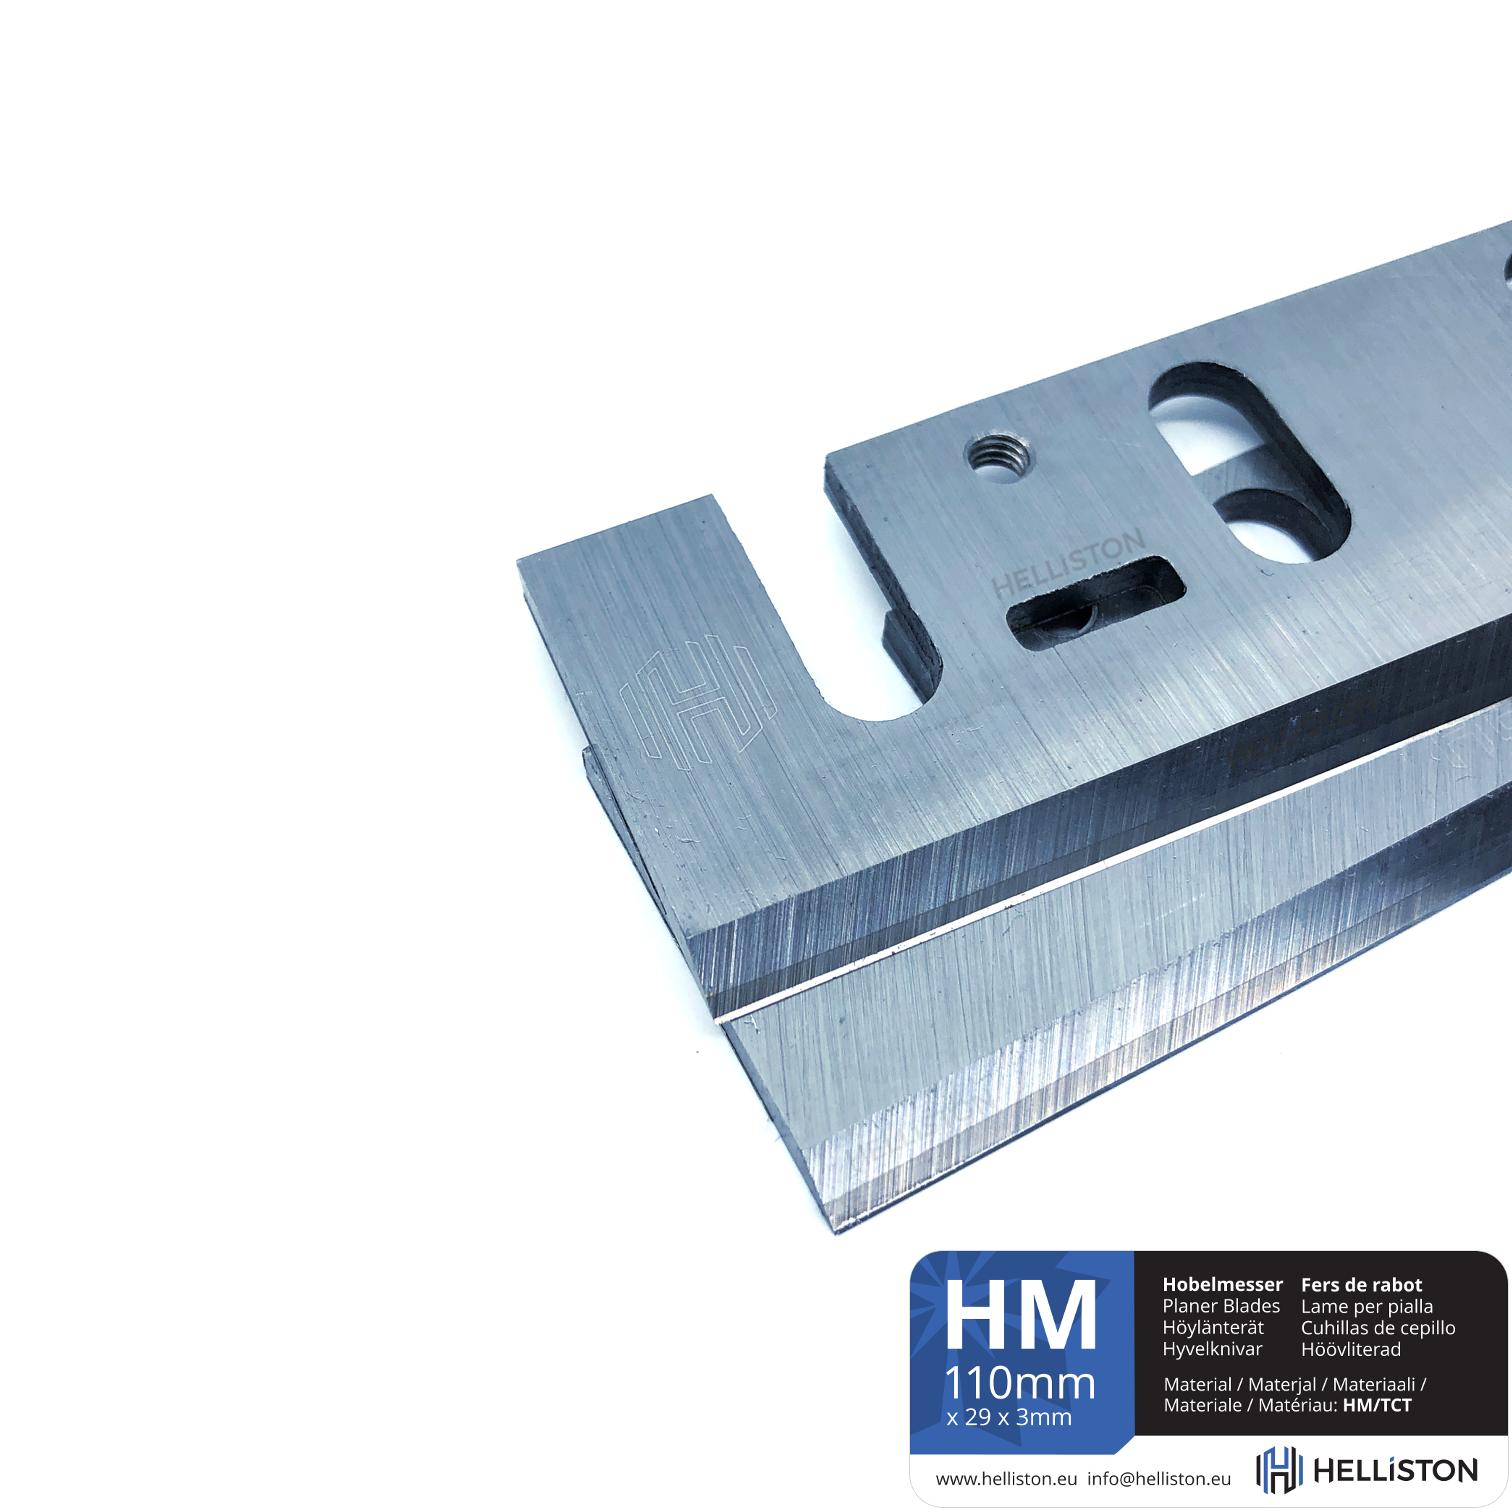 HM Planer Blades 110mm, 2 pc (for Makita 1911B, 1002BA)